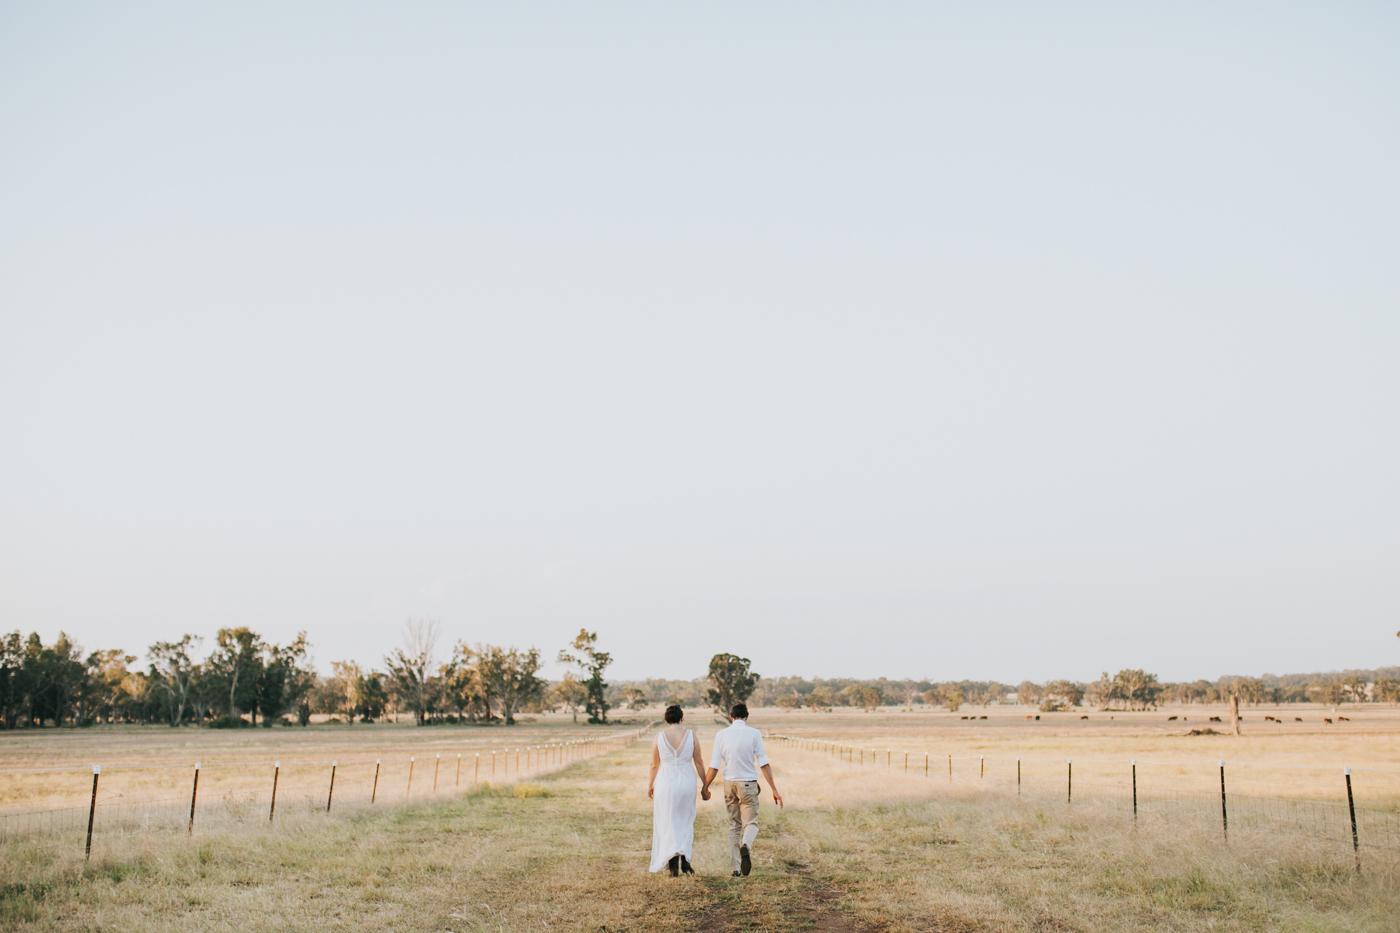 Nicolle & Jacob - Dubbo Wedding - Country Australia - Samantha Heather Photography-243.jpg